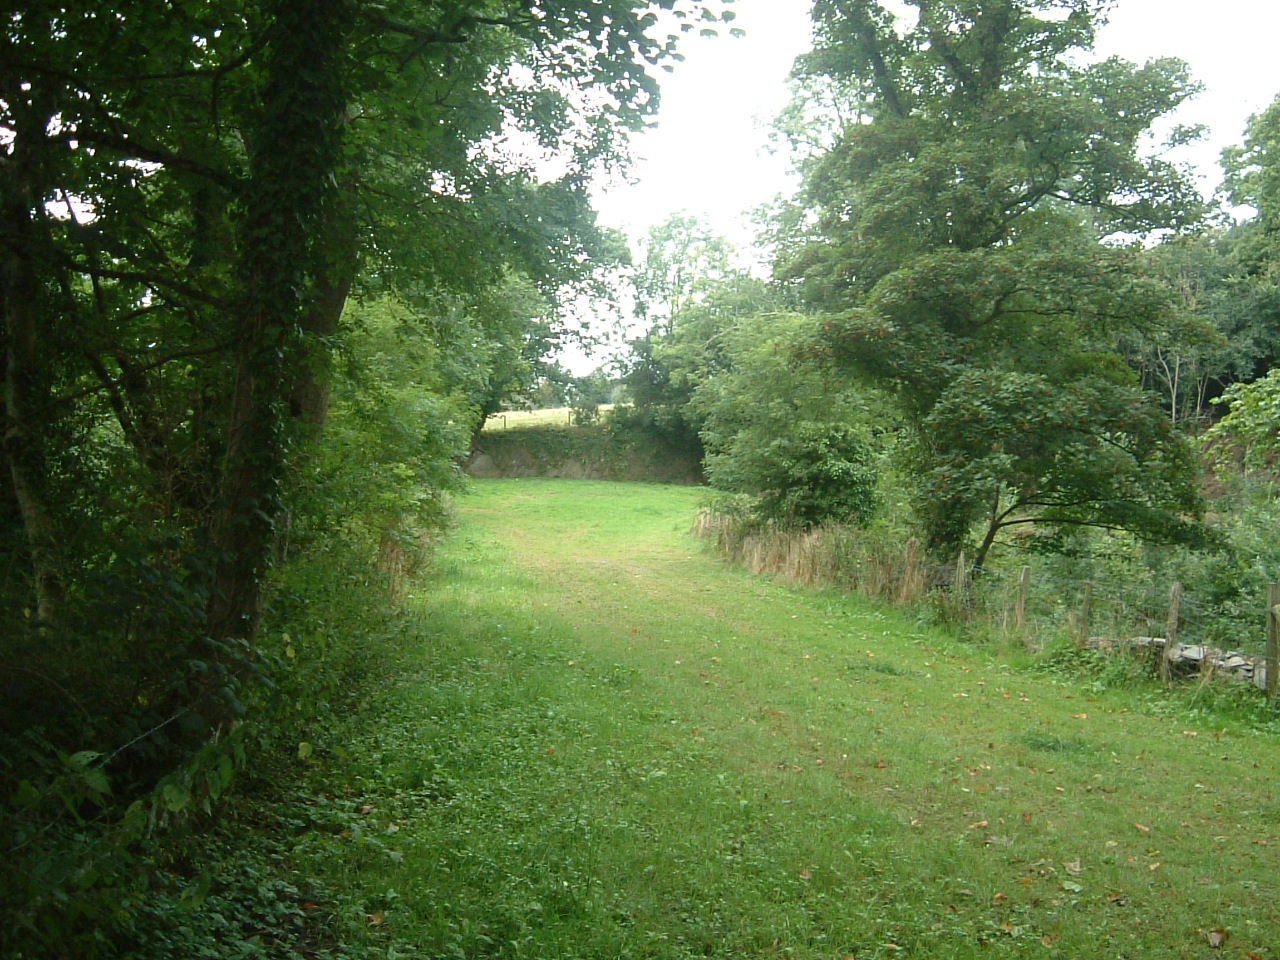 Original embankment